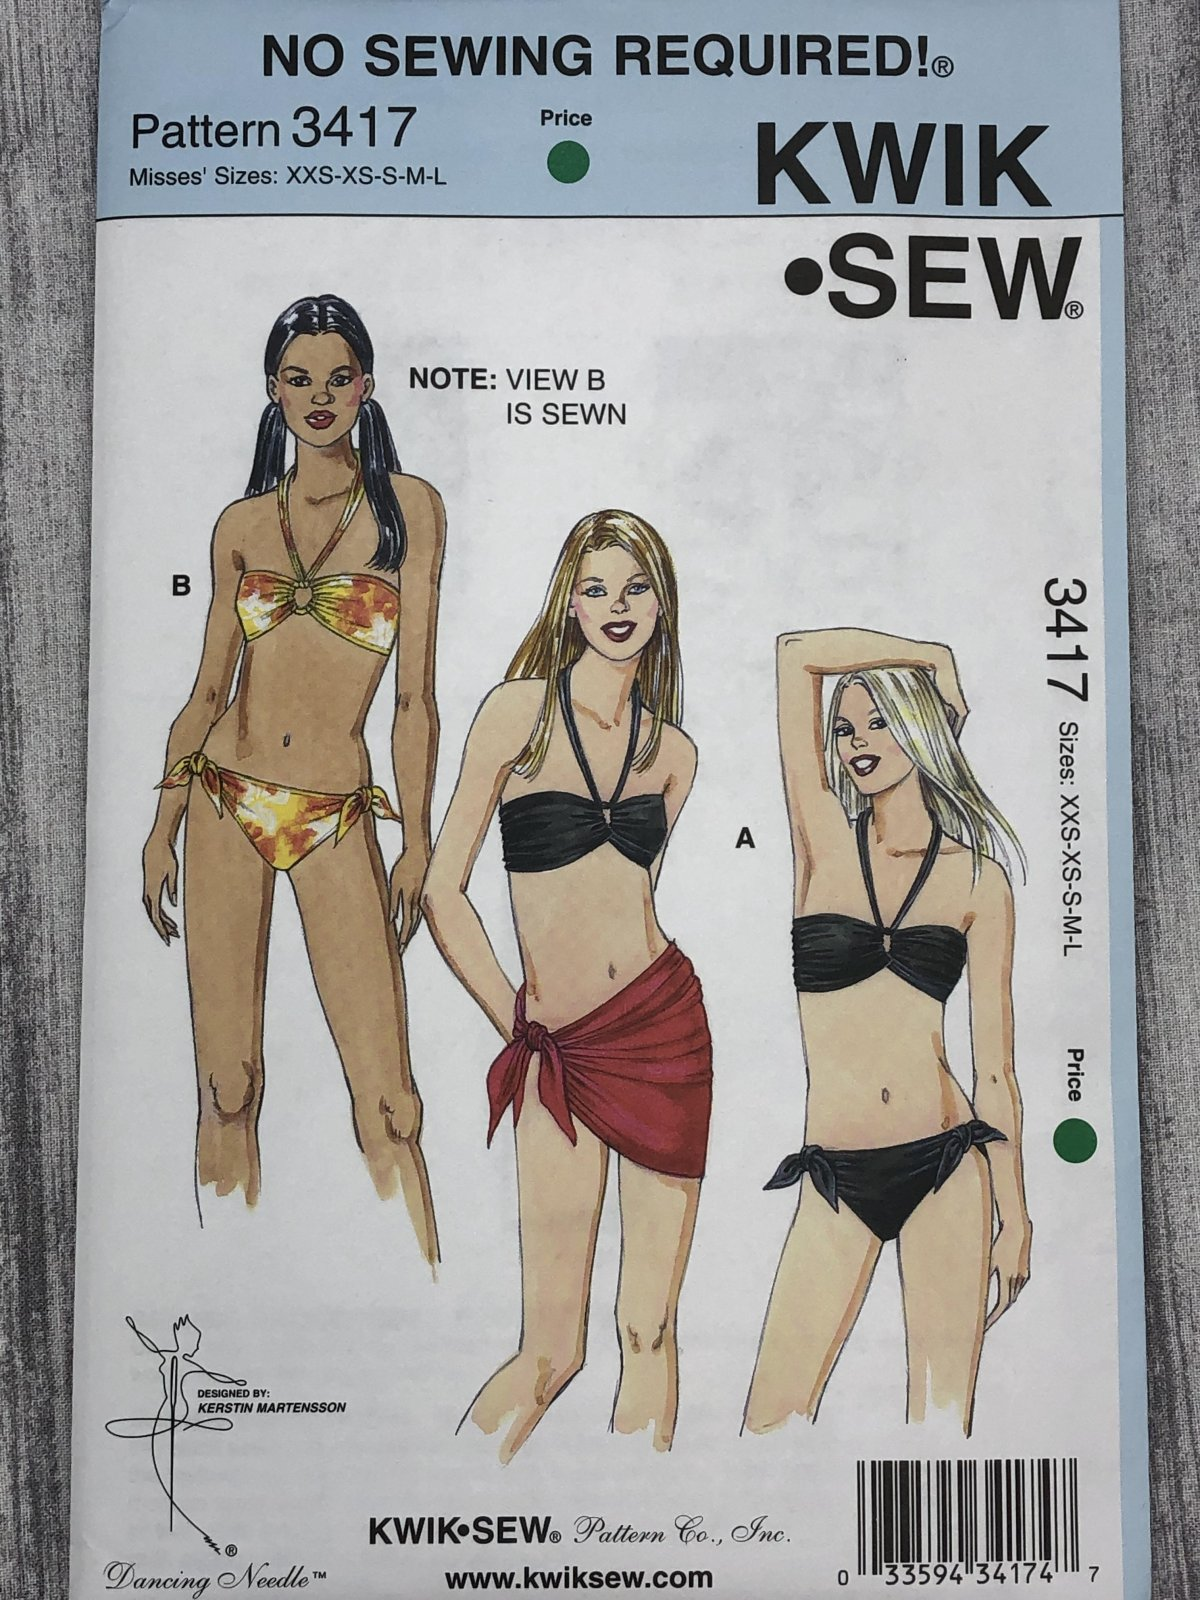 Kwik Sew 3417 Sizes XS-XL